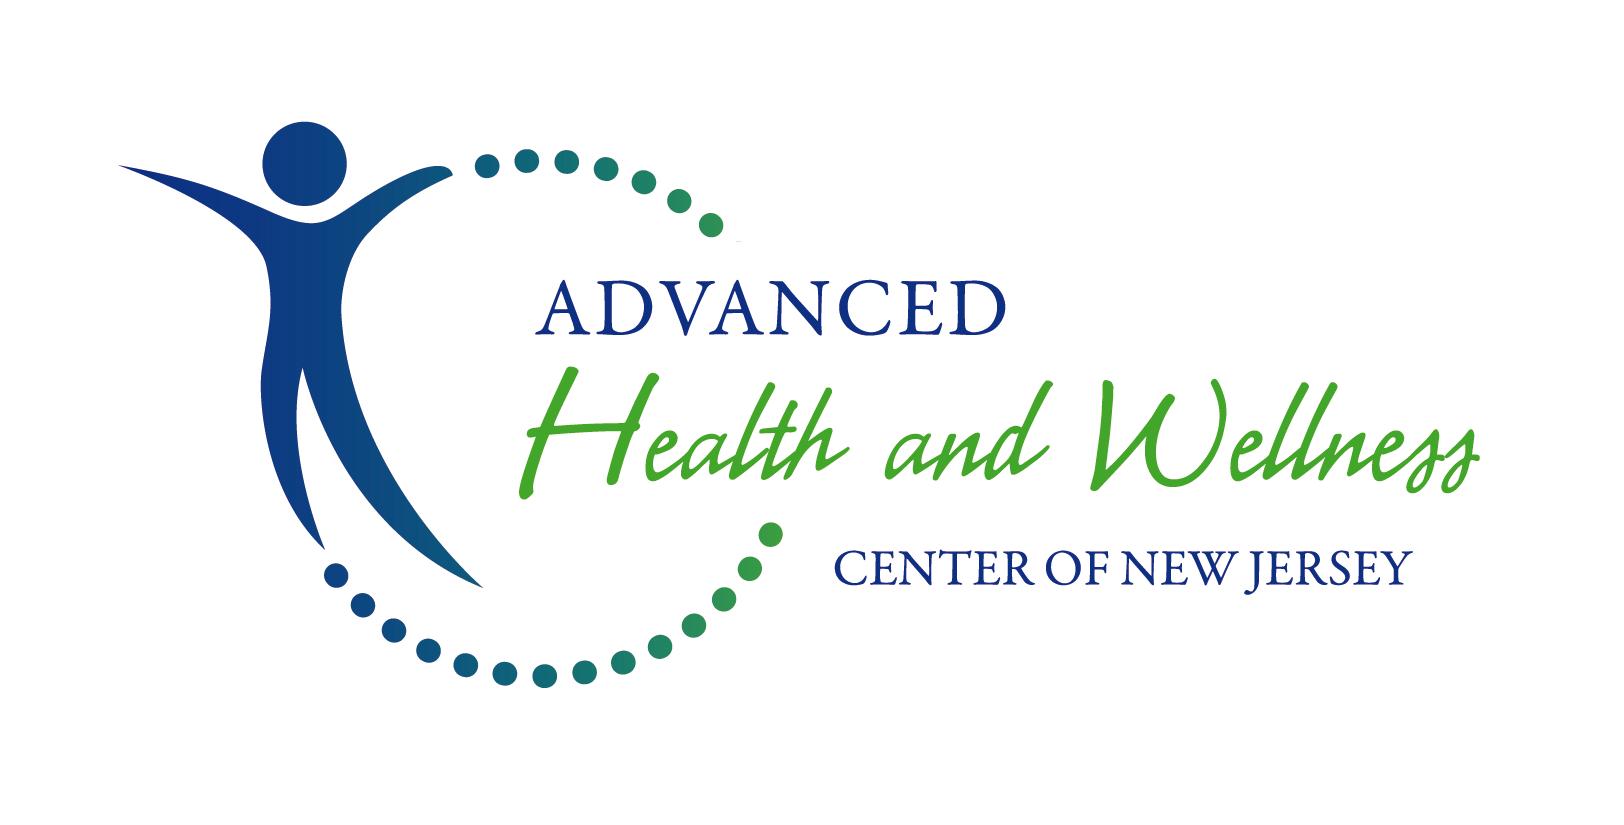 Advanced Health and Wellness